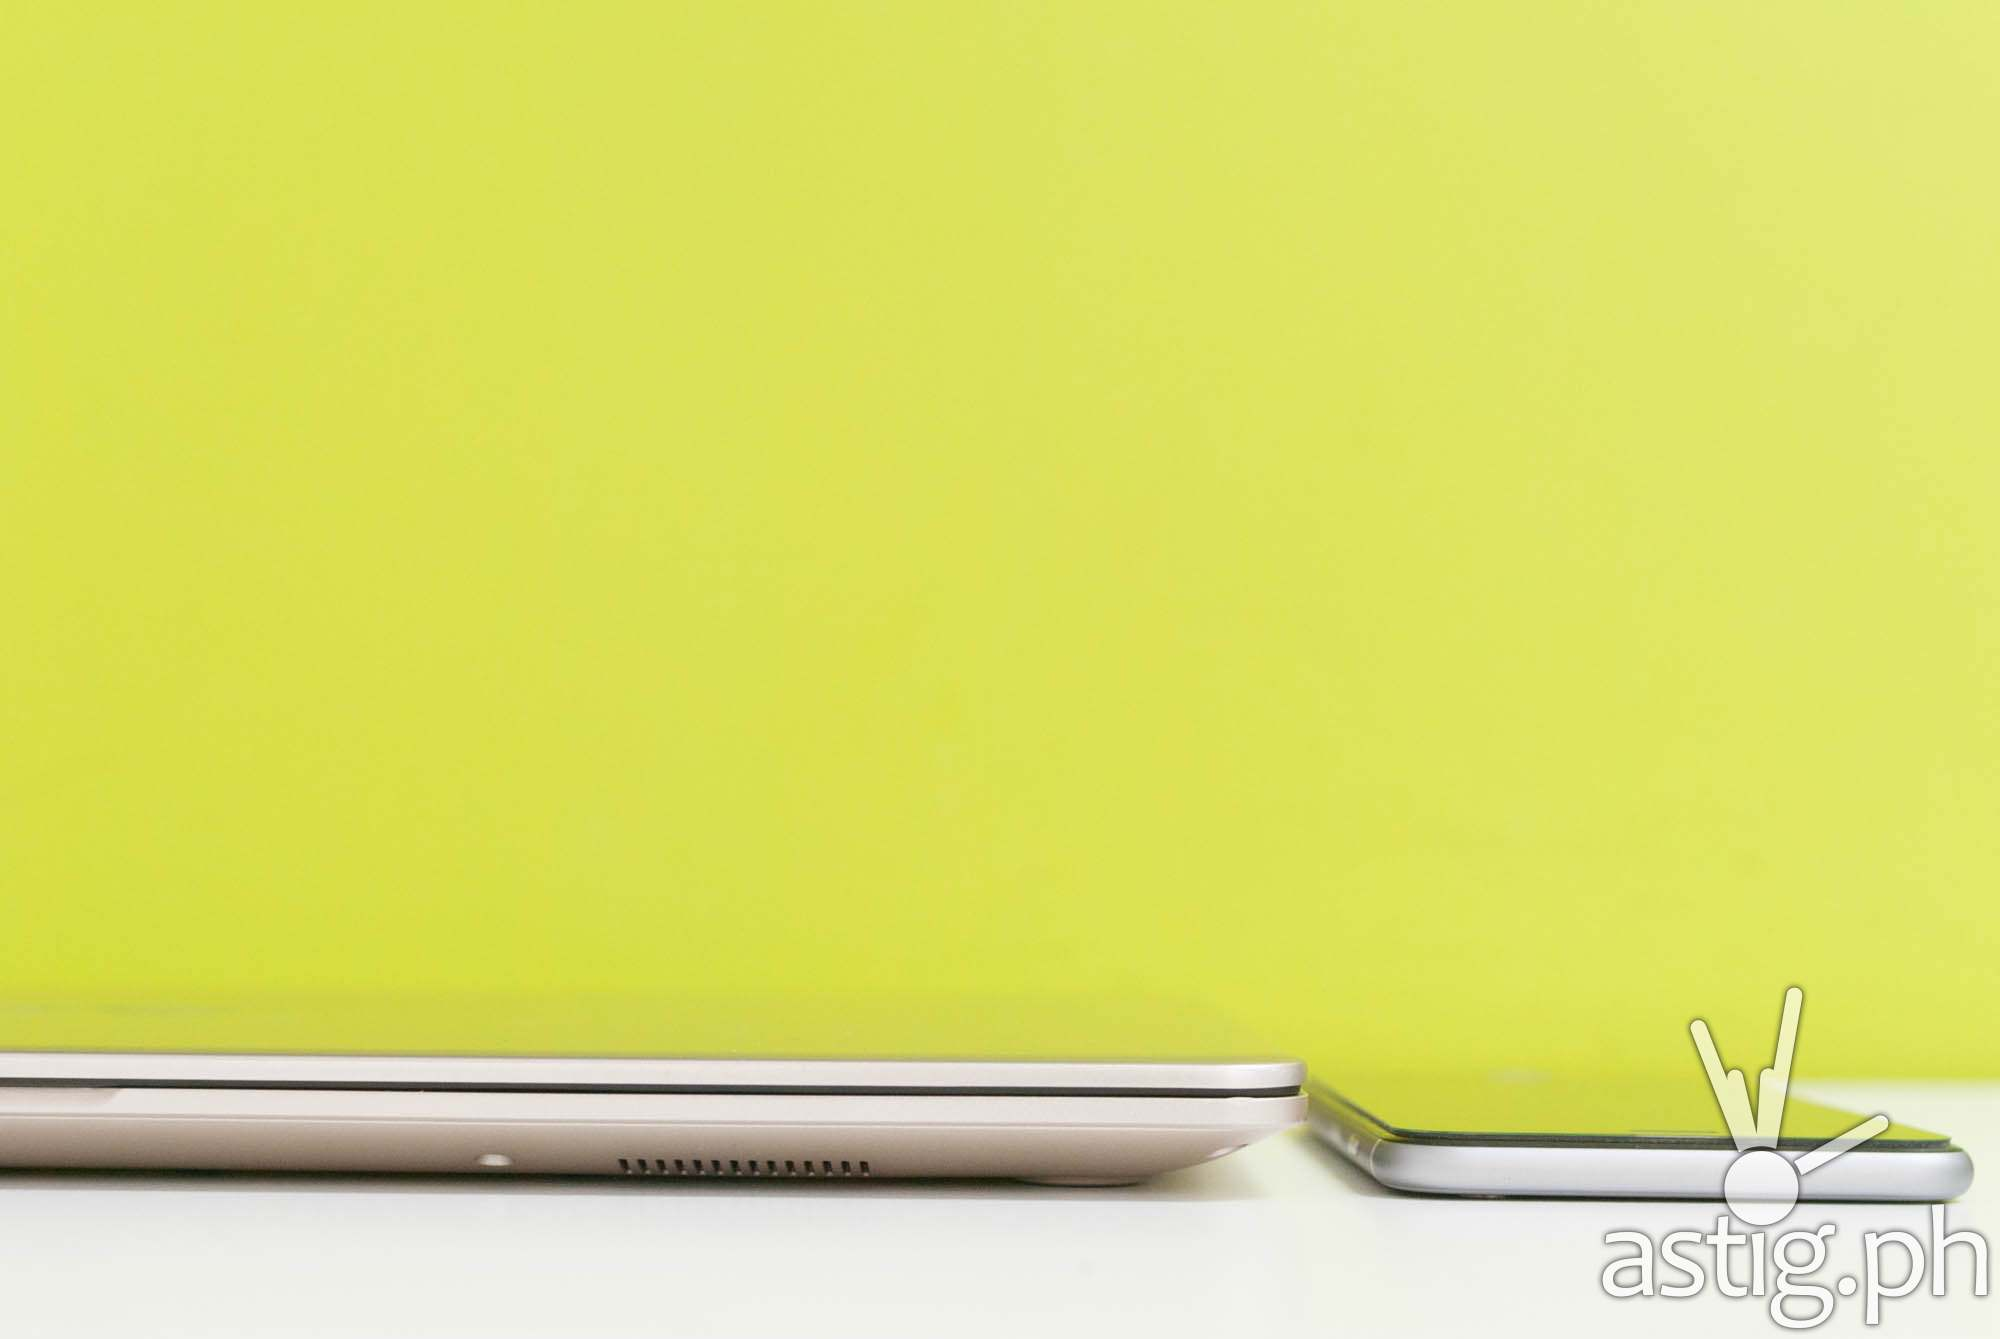 ASUS VivoBook S15 (19.4mm) thickness comparison vs iPhone Plus (7.2mm)